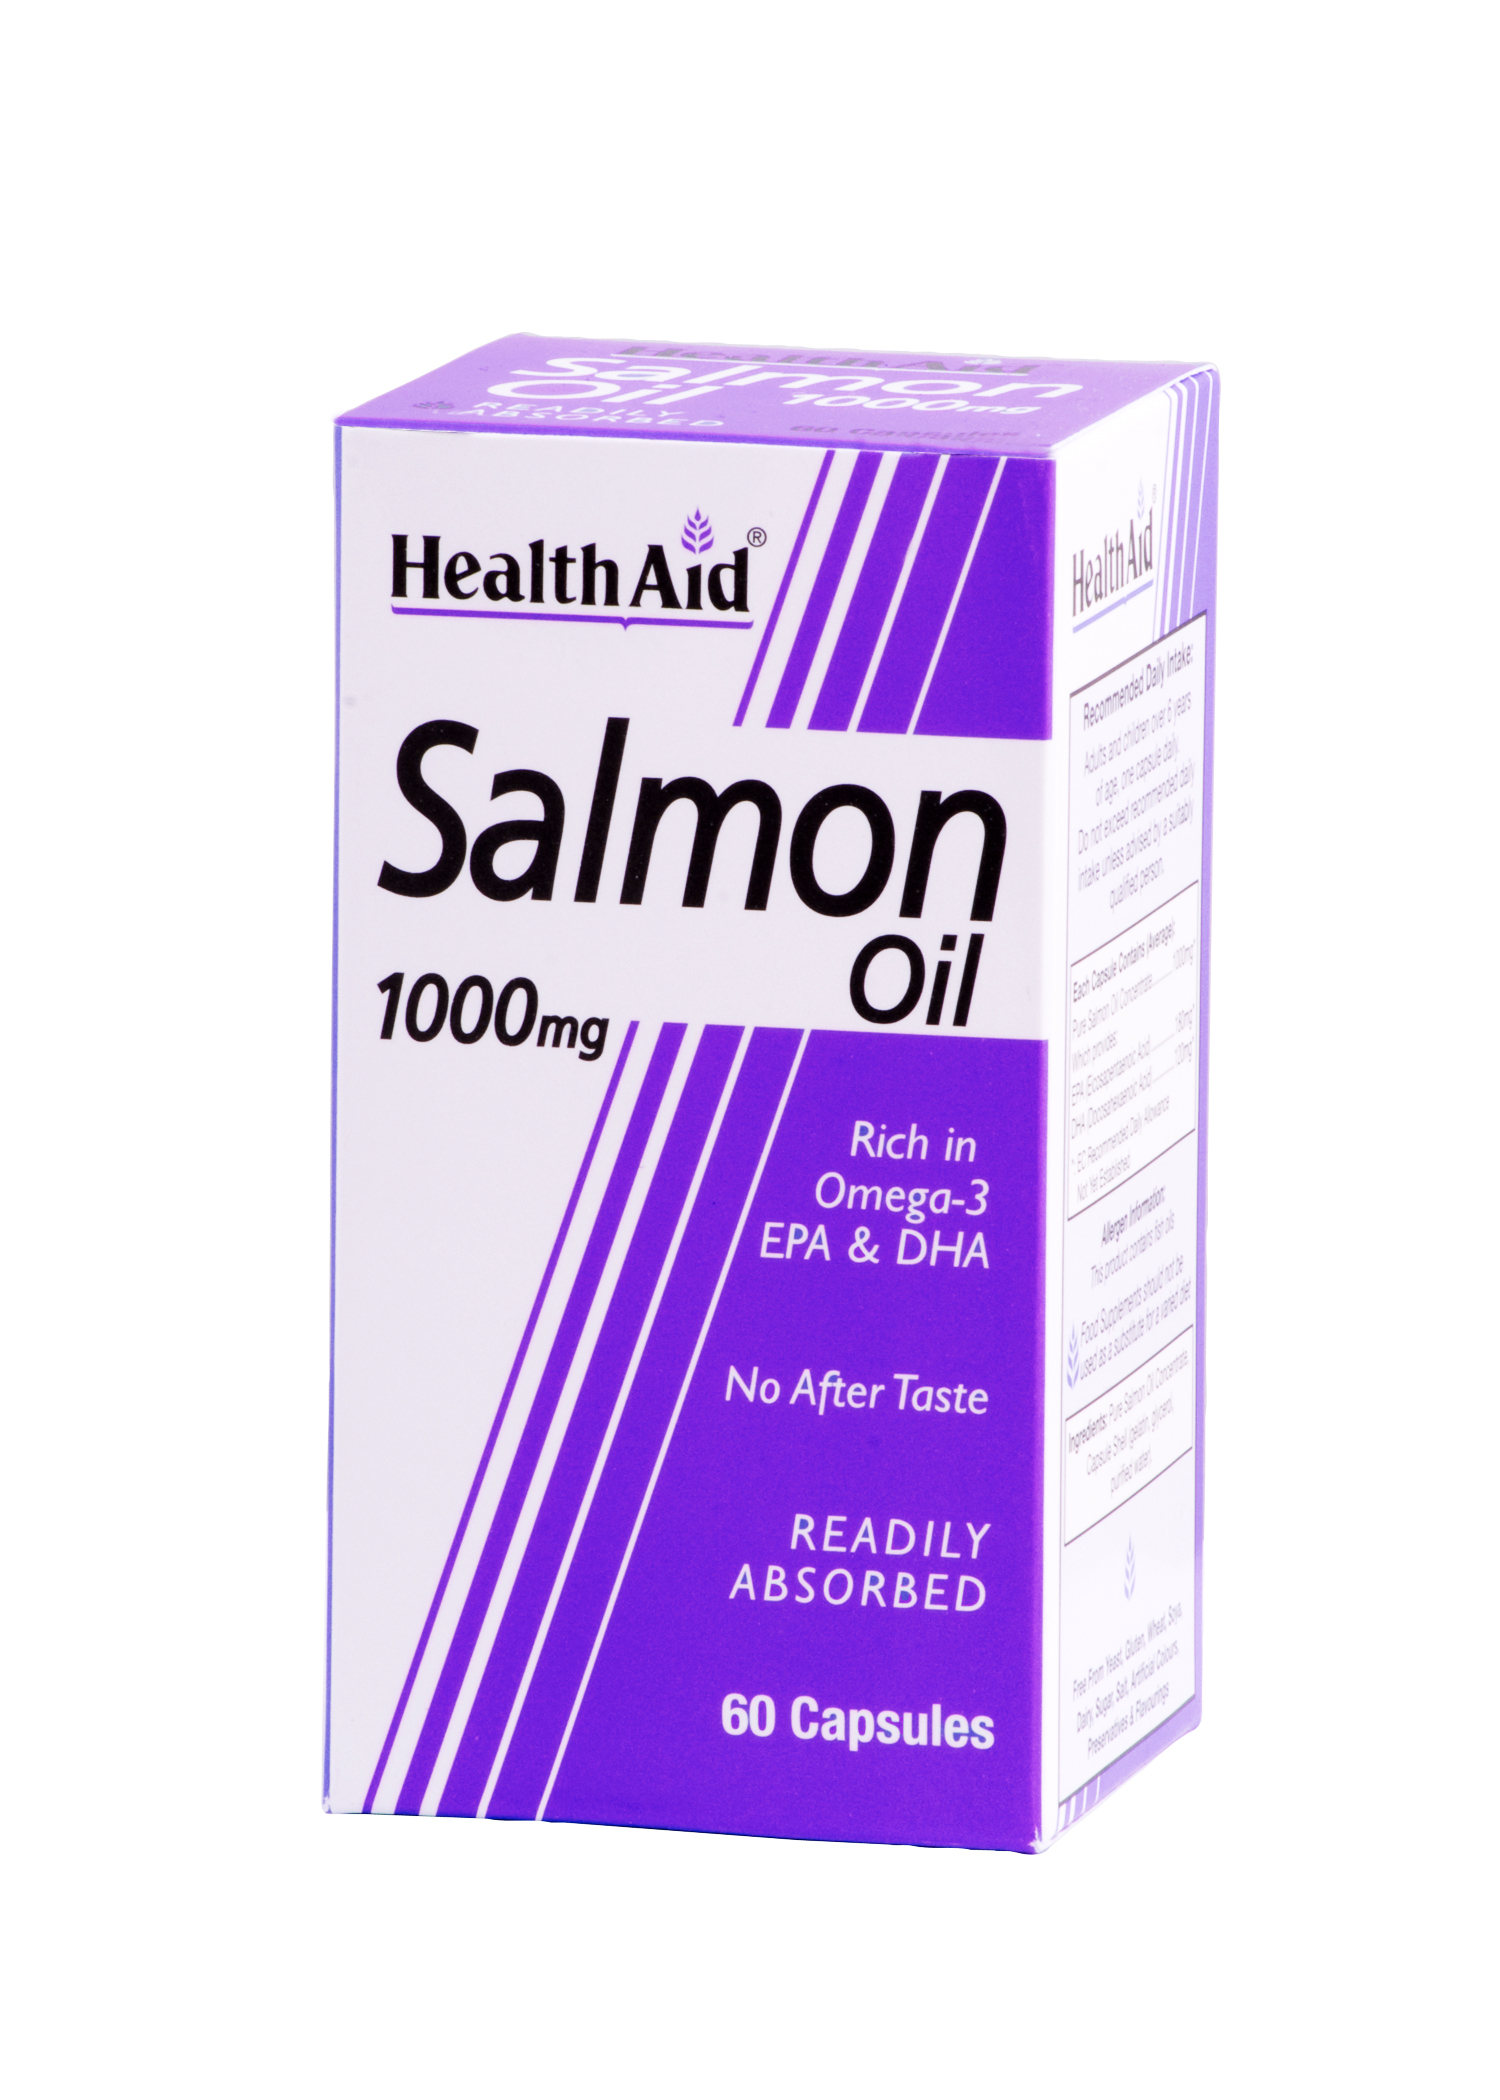 Health Aid Salmon Oil Freshwater 1000Mg Καρδιαγγειακή Και Κυκλοφορική Προστασία 60tabs